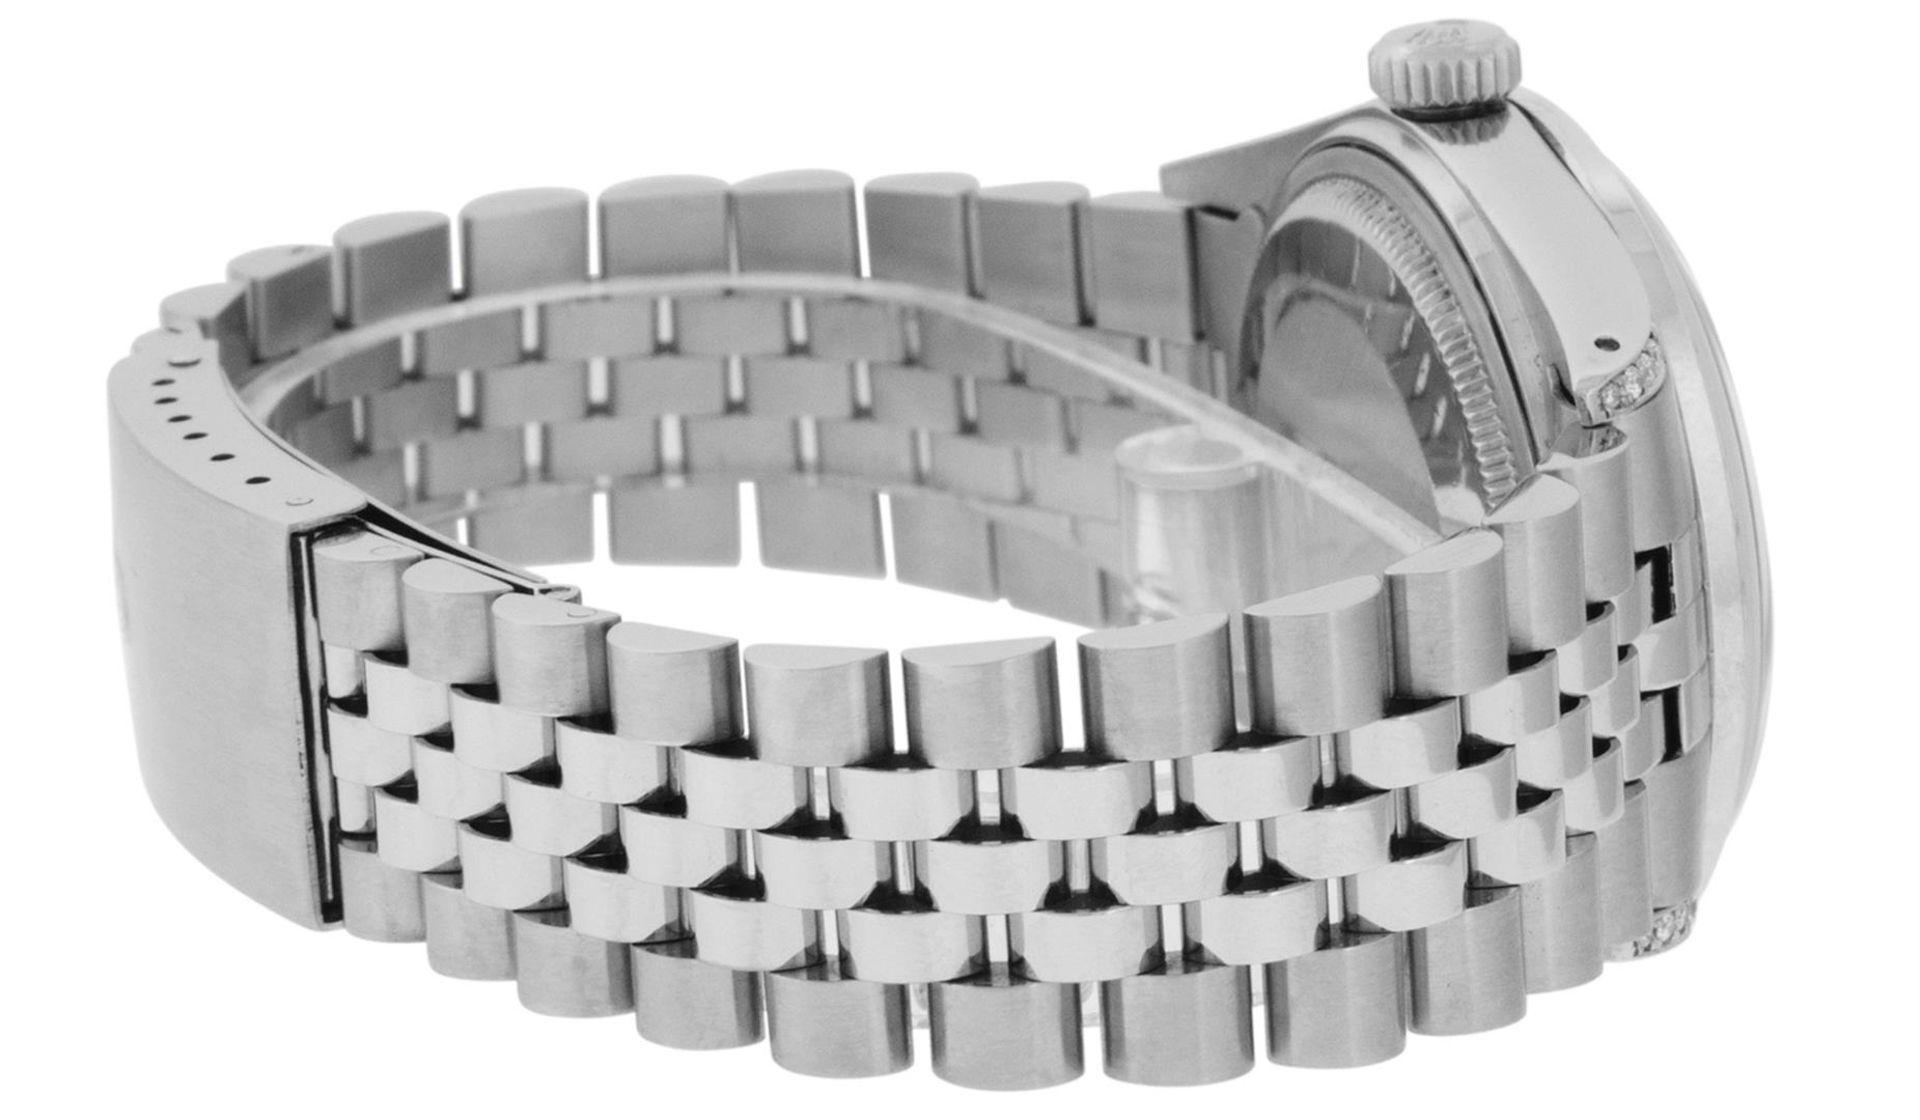 Rolex Mens Stainless Steel Black Diamond Lugs & Sapphire Datejust Wristwatch Oys - Image 8 of 9